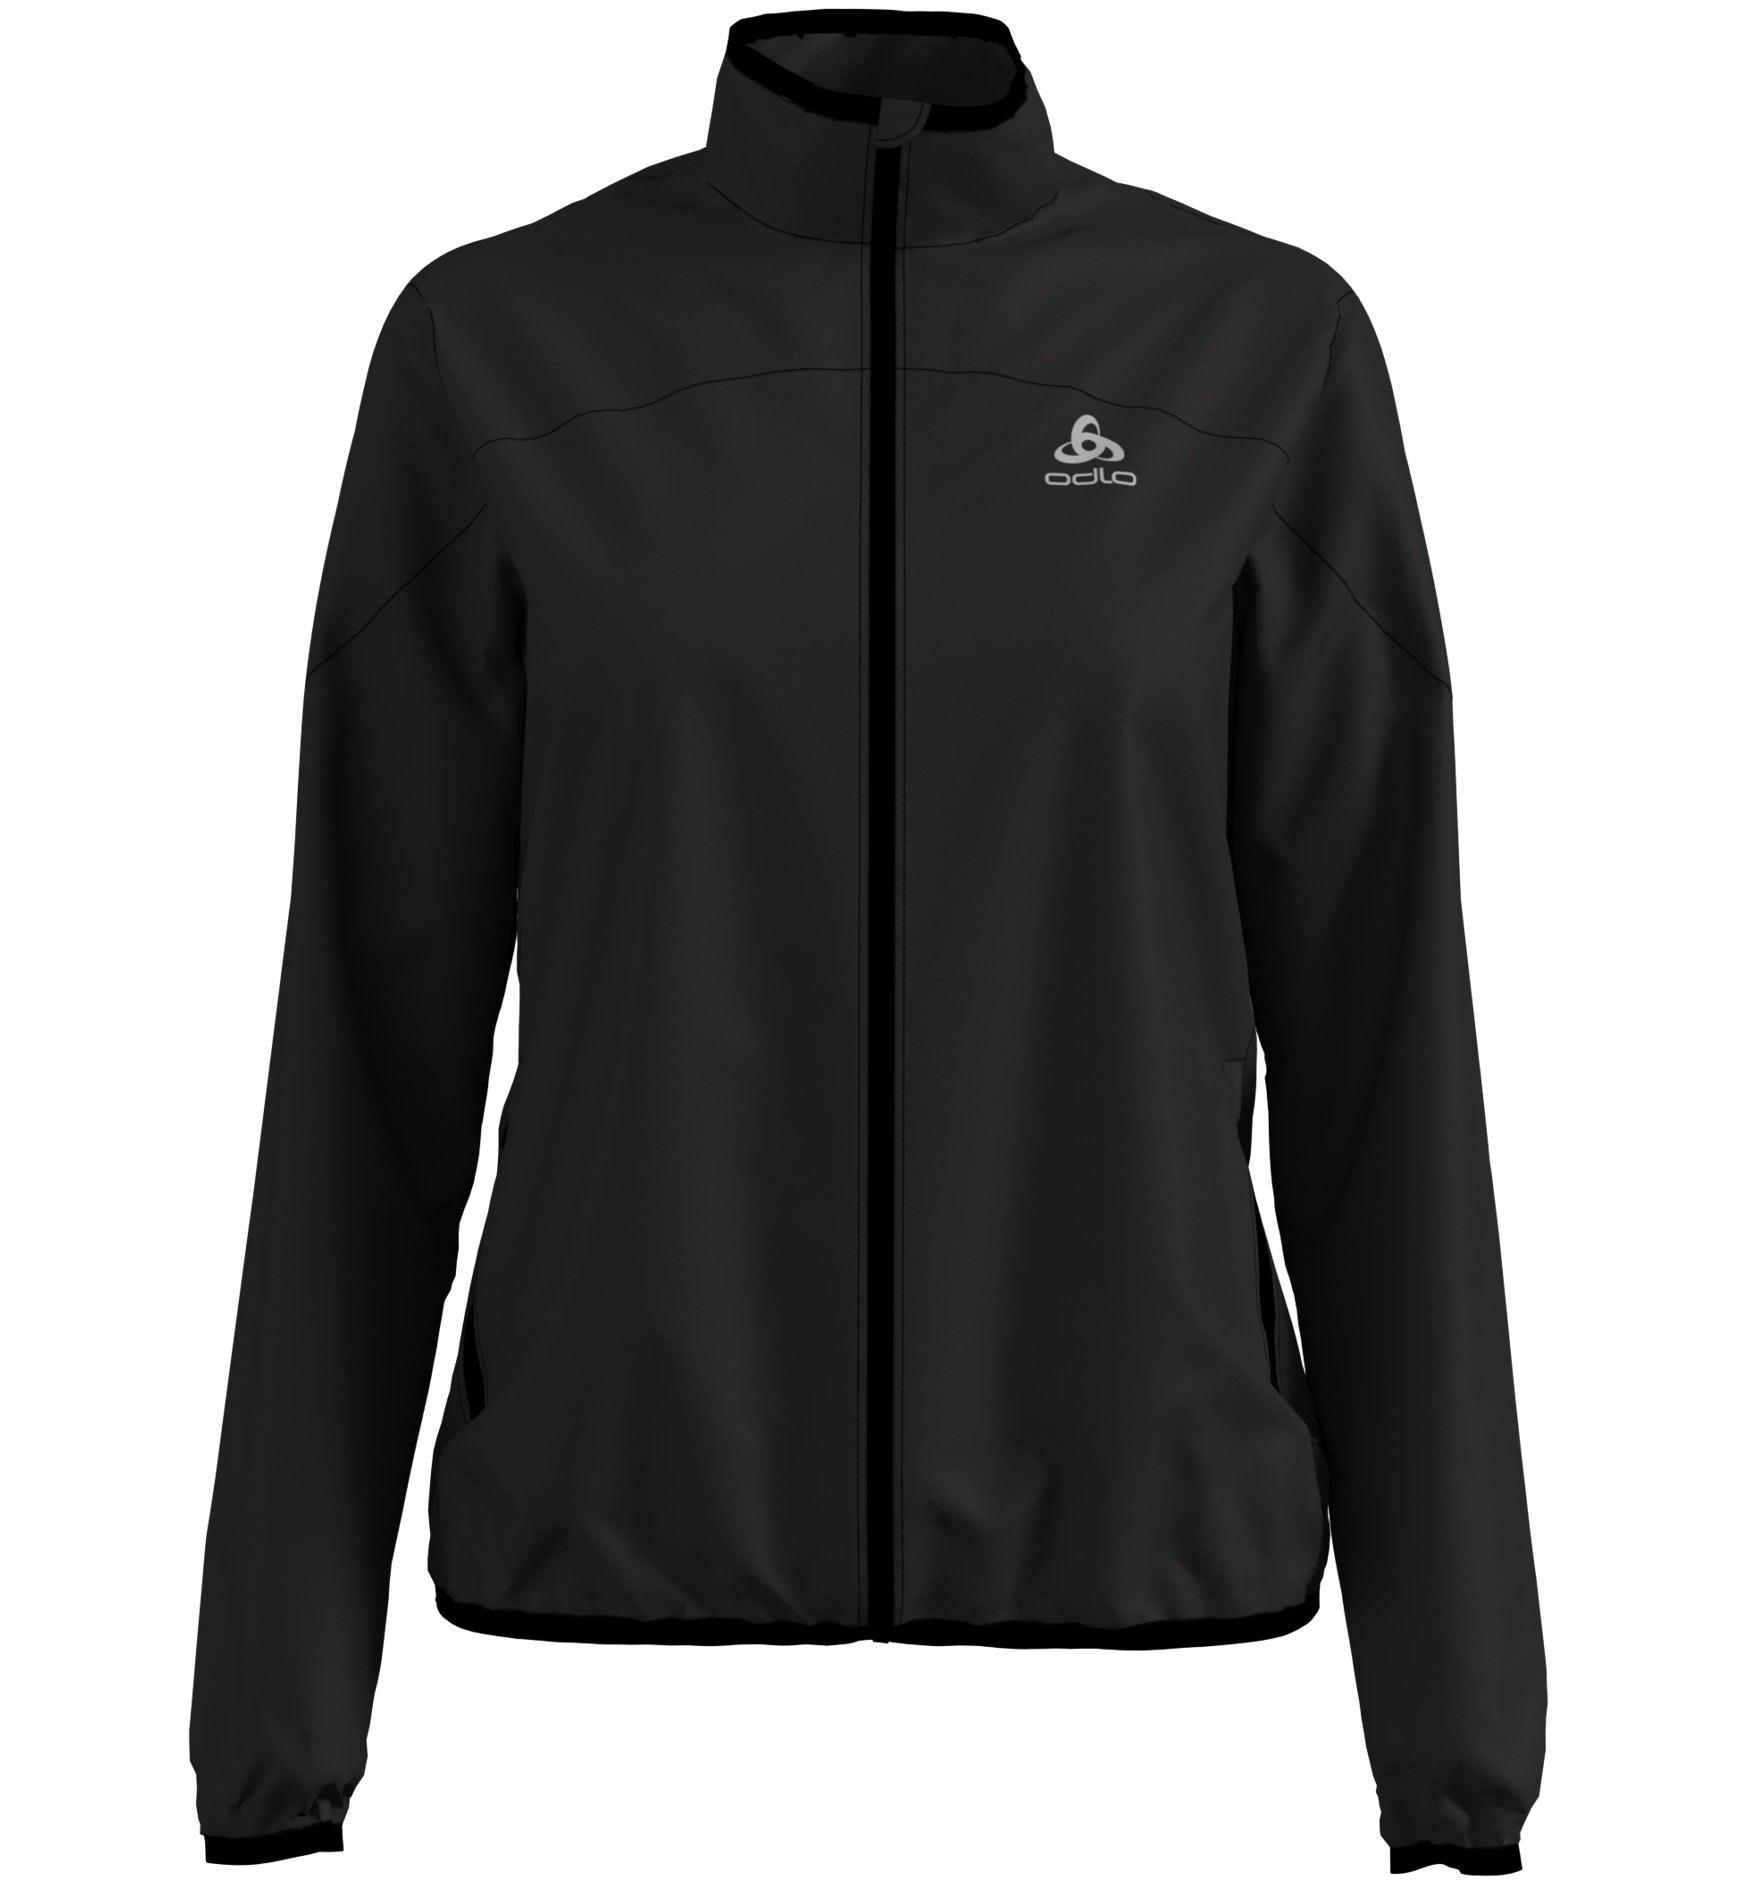 Odlo Core Light Jacket - giacca running - donna